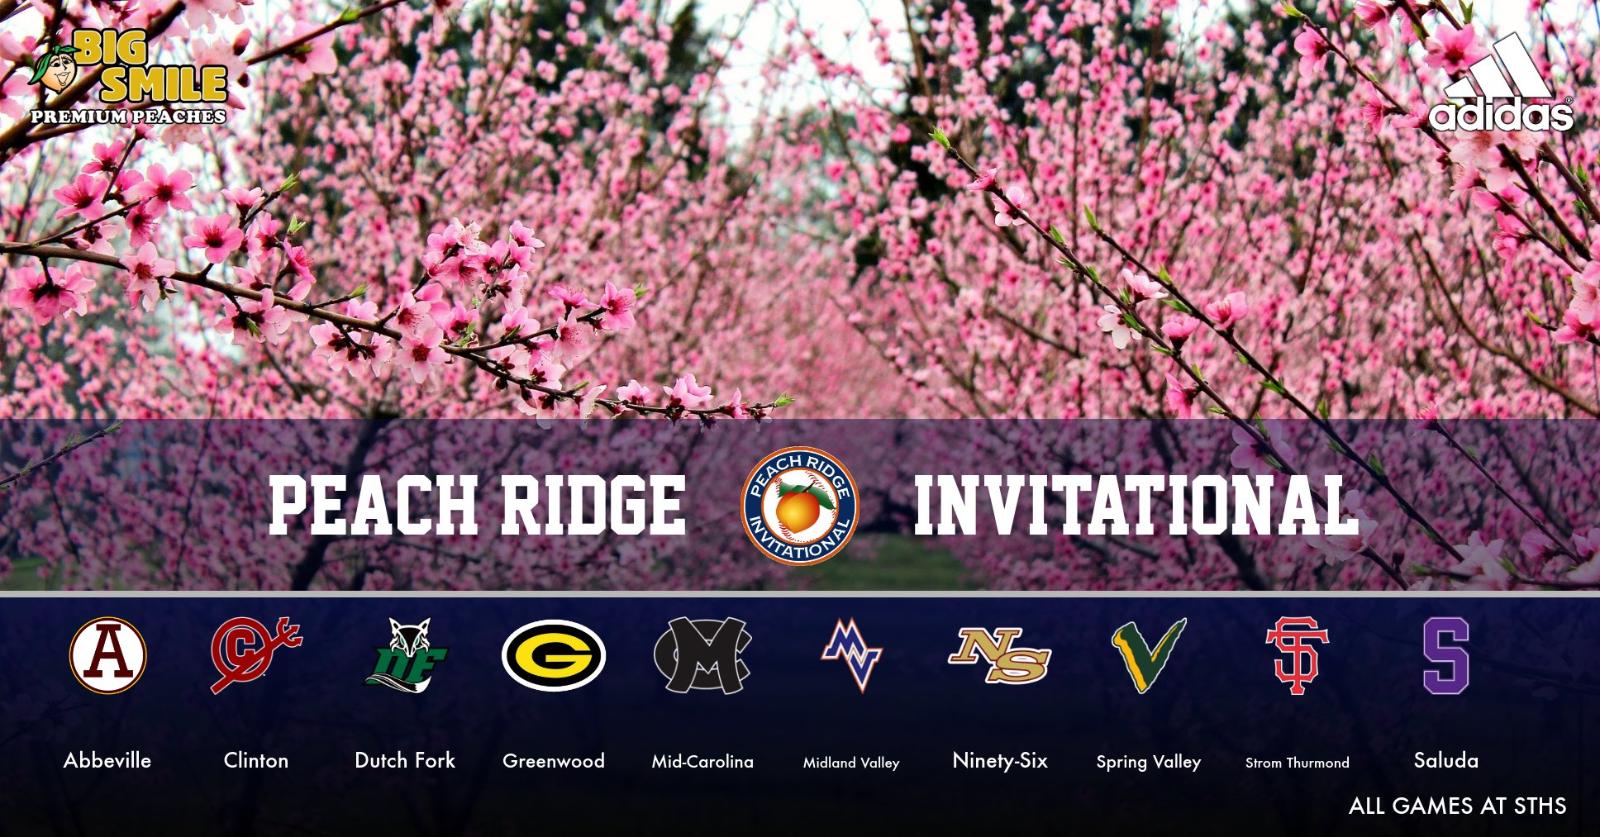 3rd Annual Peach Ridge Invitational Begins Friday February 28th